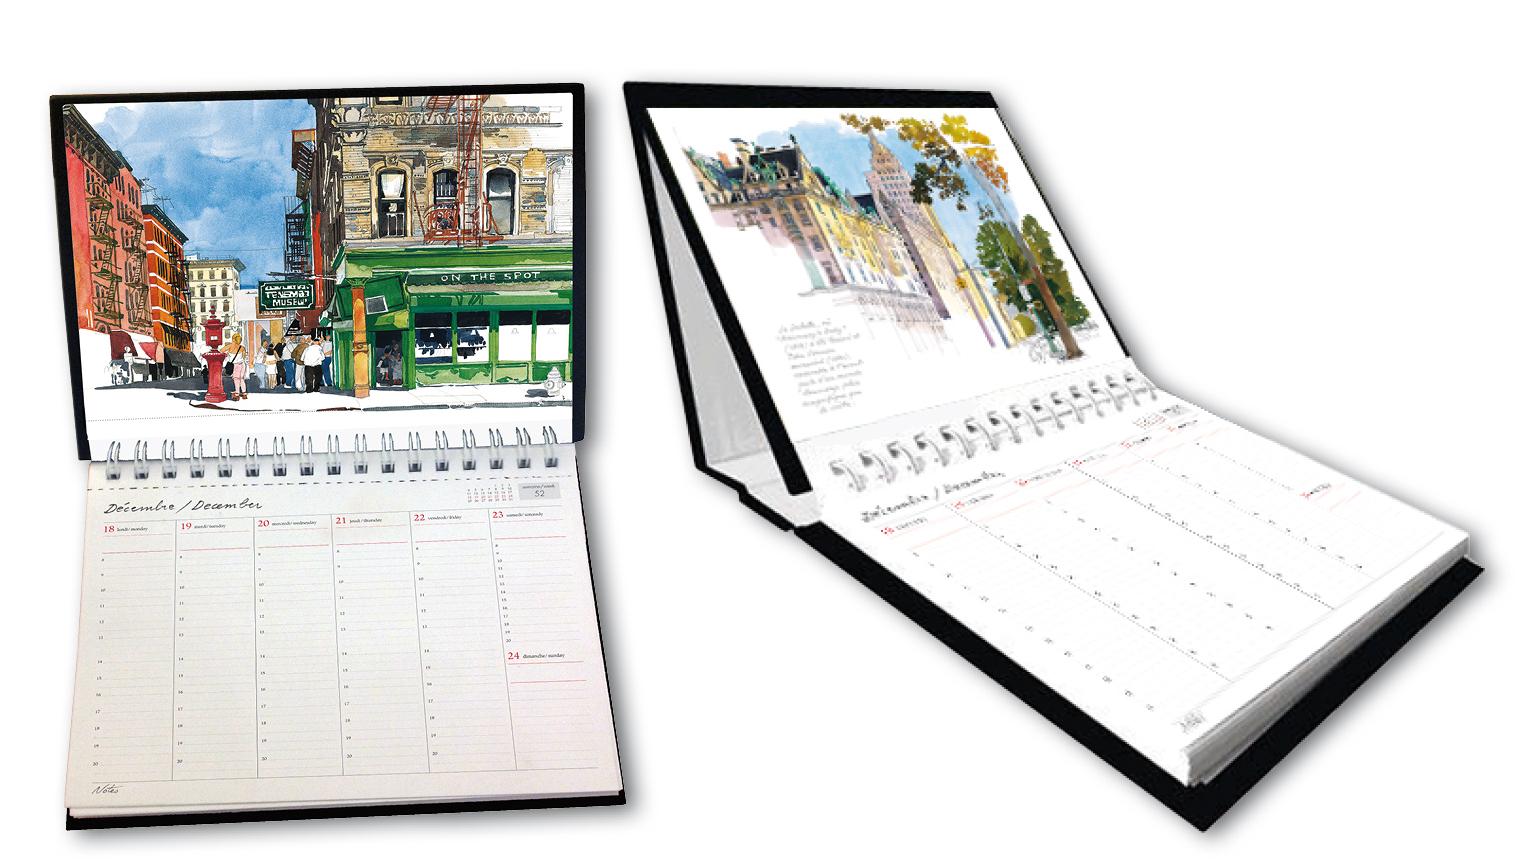 NYC Desk Calendar 2018